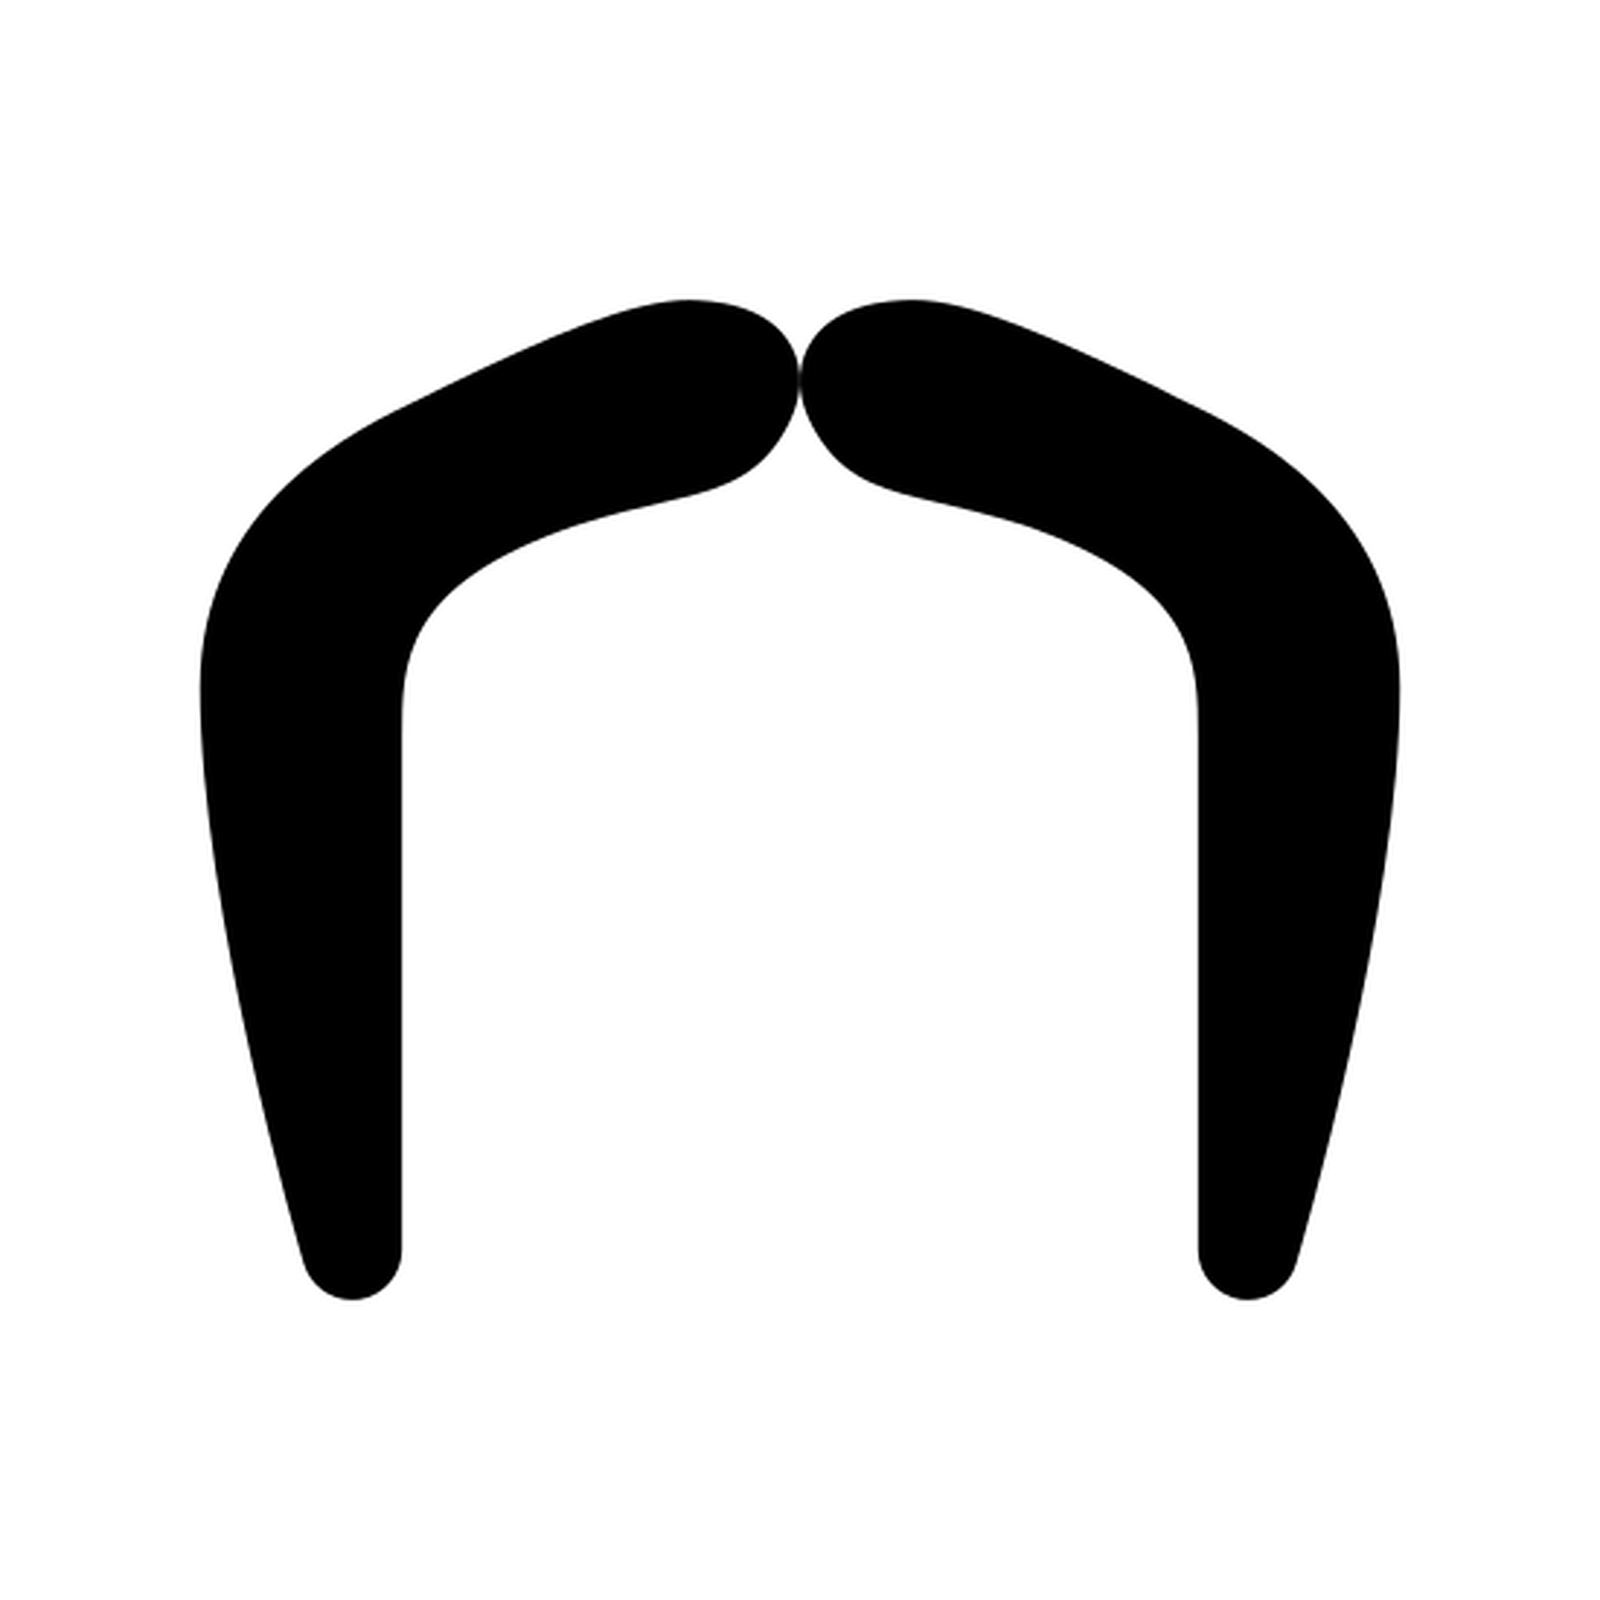 Fu Manchu Mustache icon